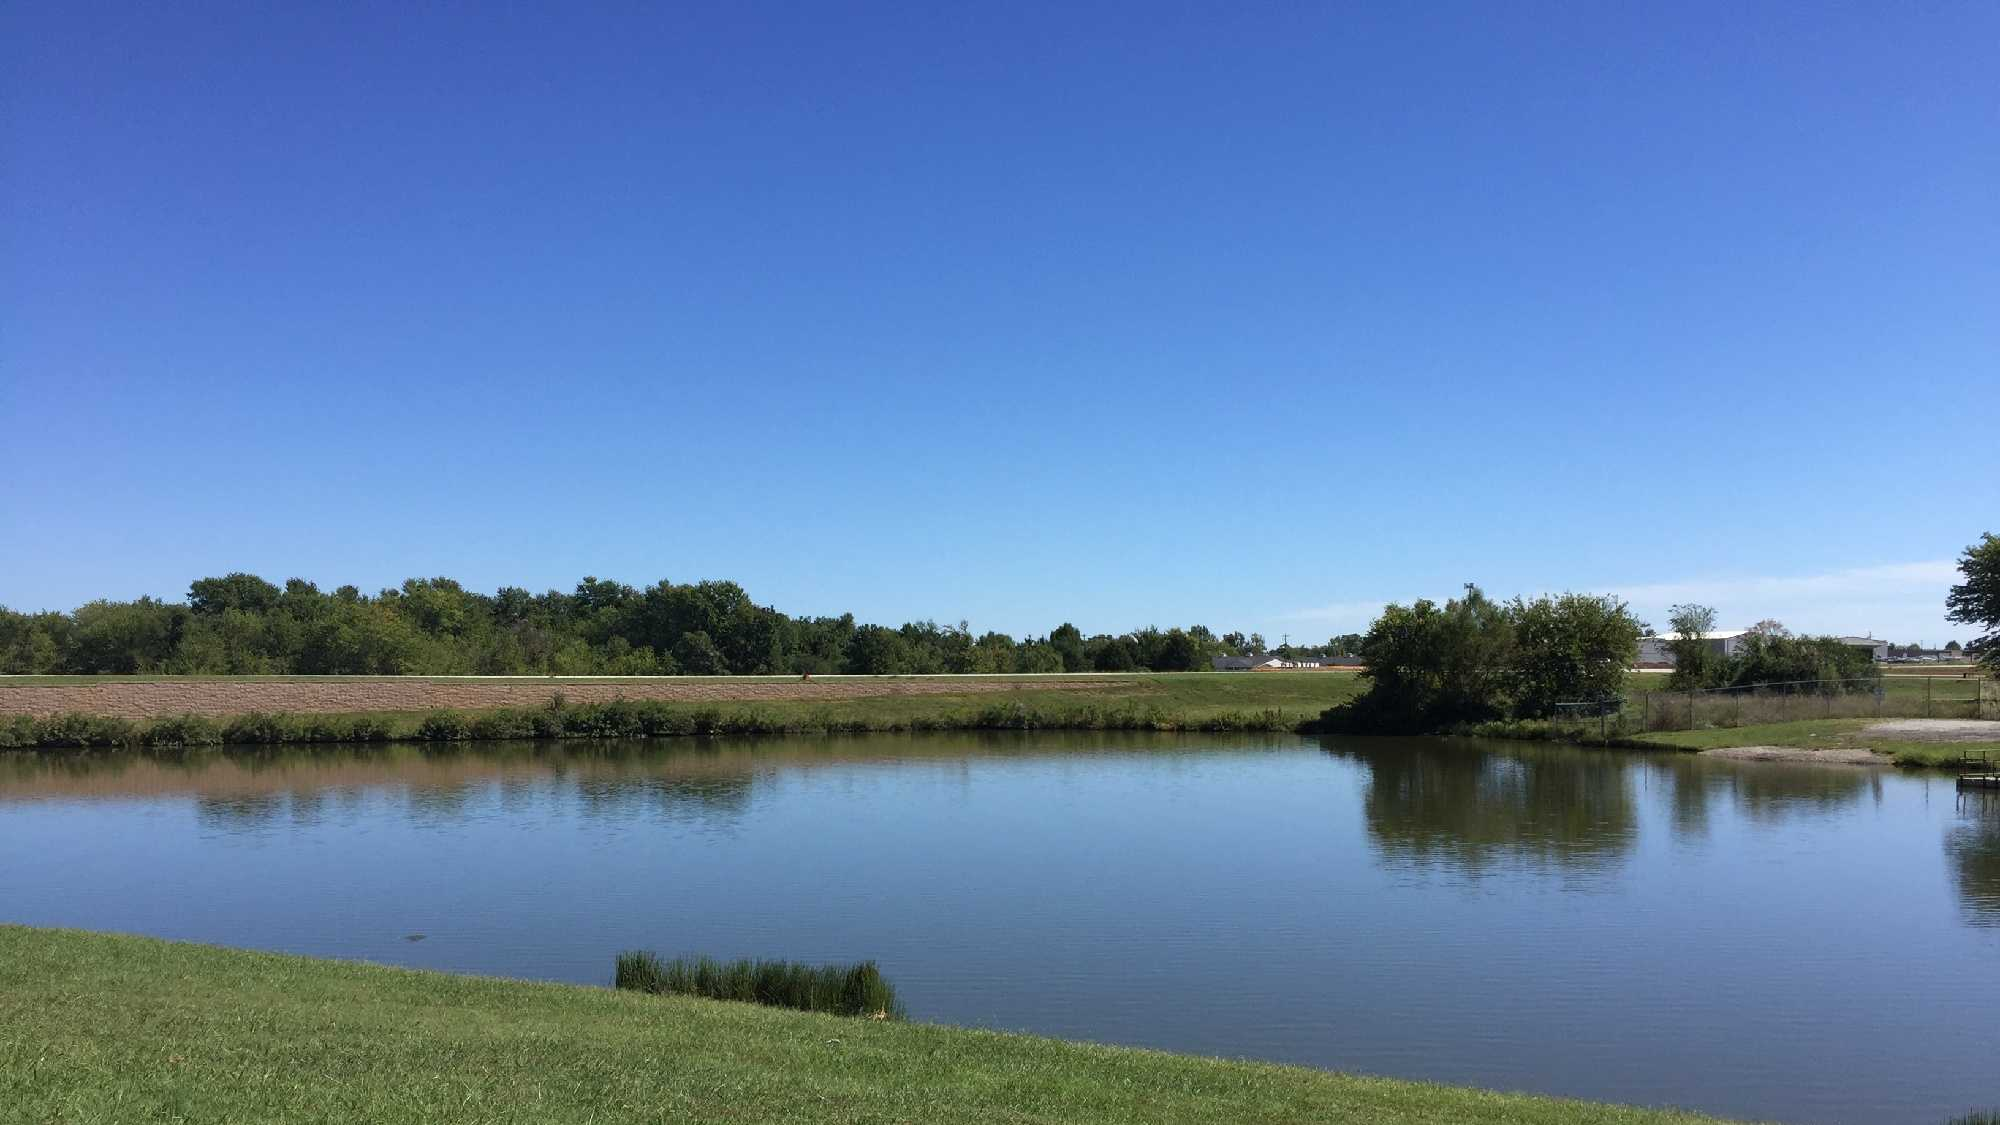 bntonville lake